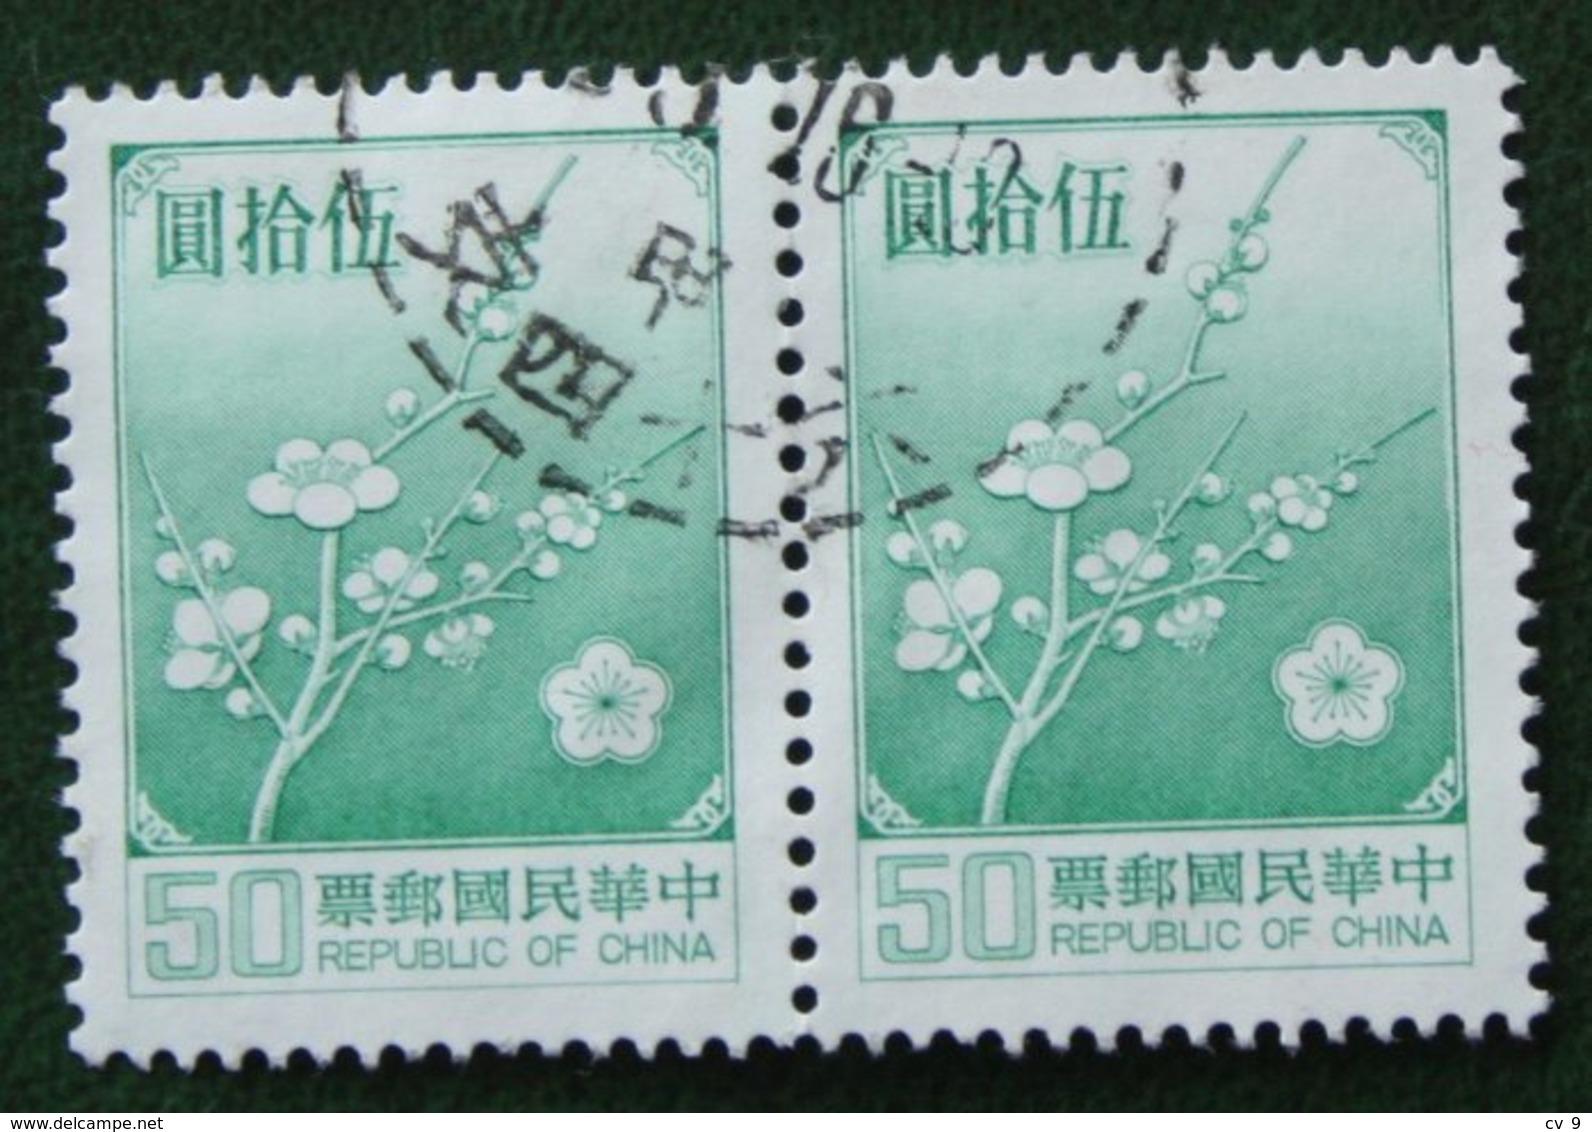 Flower Fleur Bloemen Blume 1979 (Mi 1293 YT 1239) Used Gebruikt Oblitere TAIWAN FORMOSA - 1945-... República De China